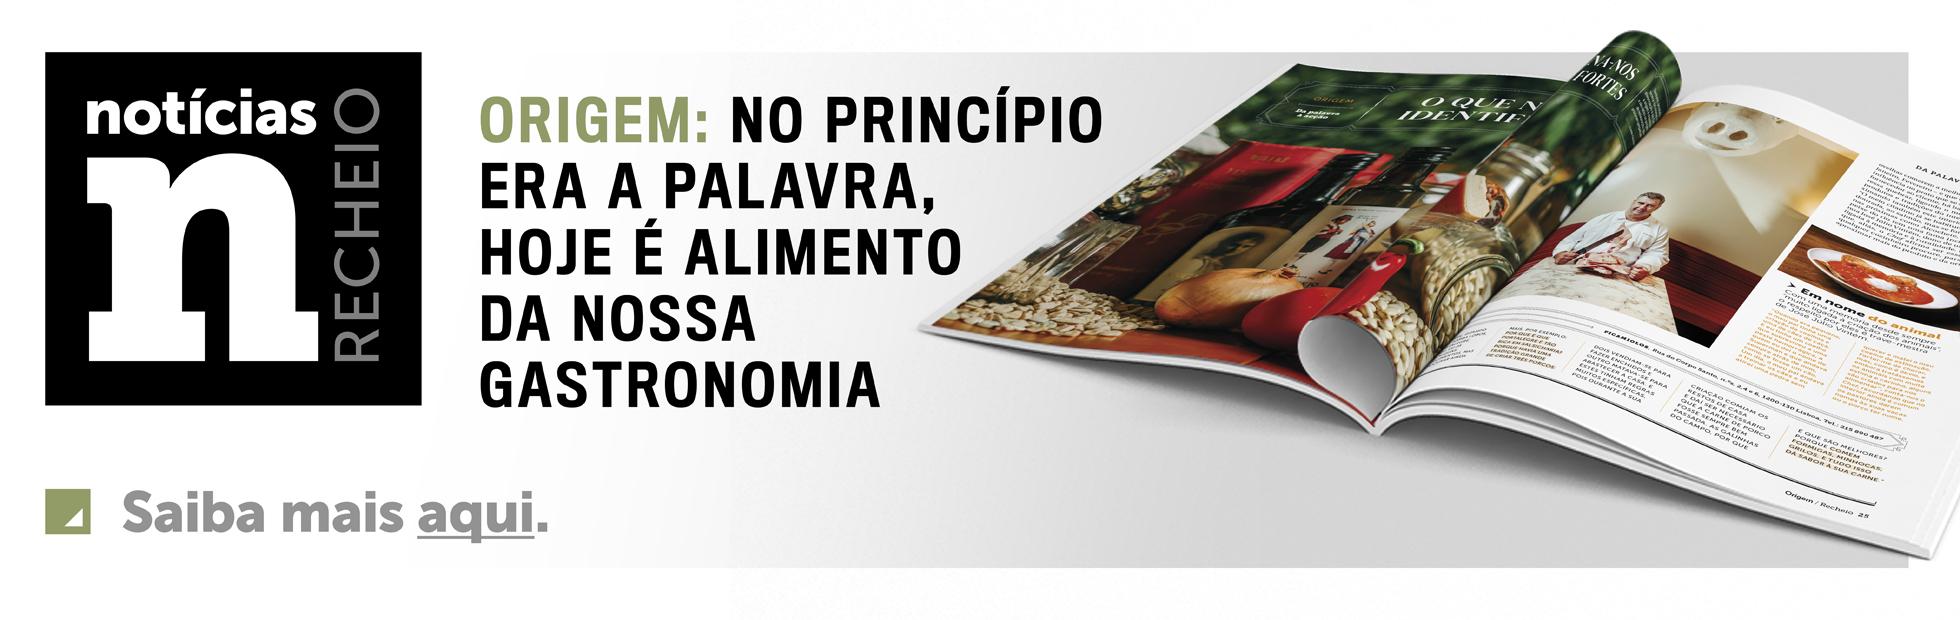 NR110-Banner-2-Homepage-1960x620